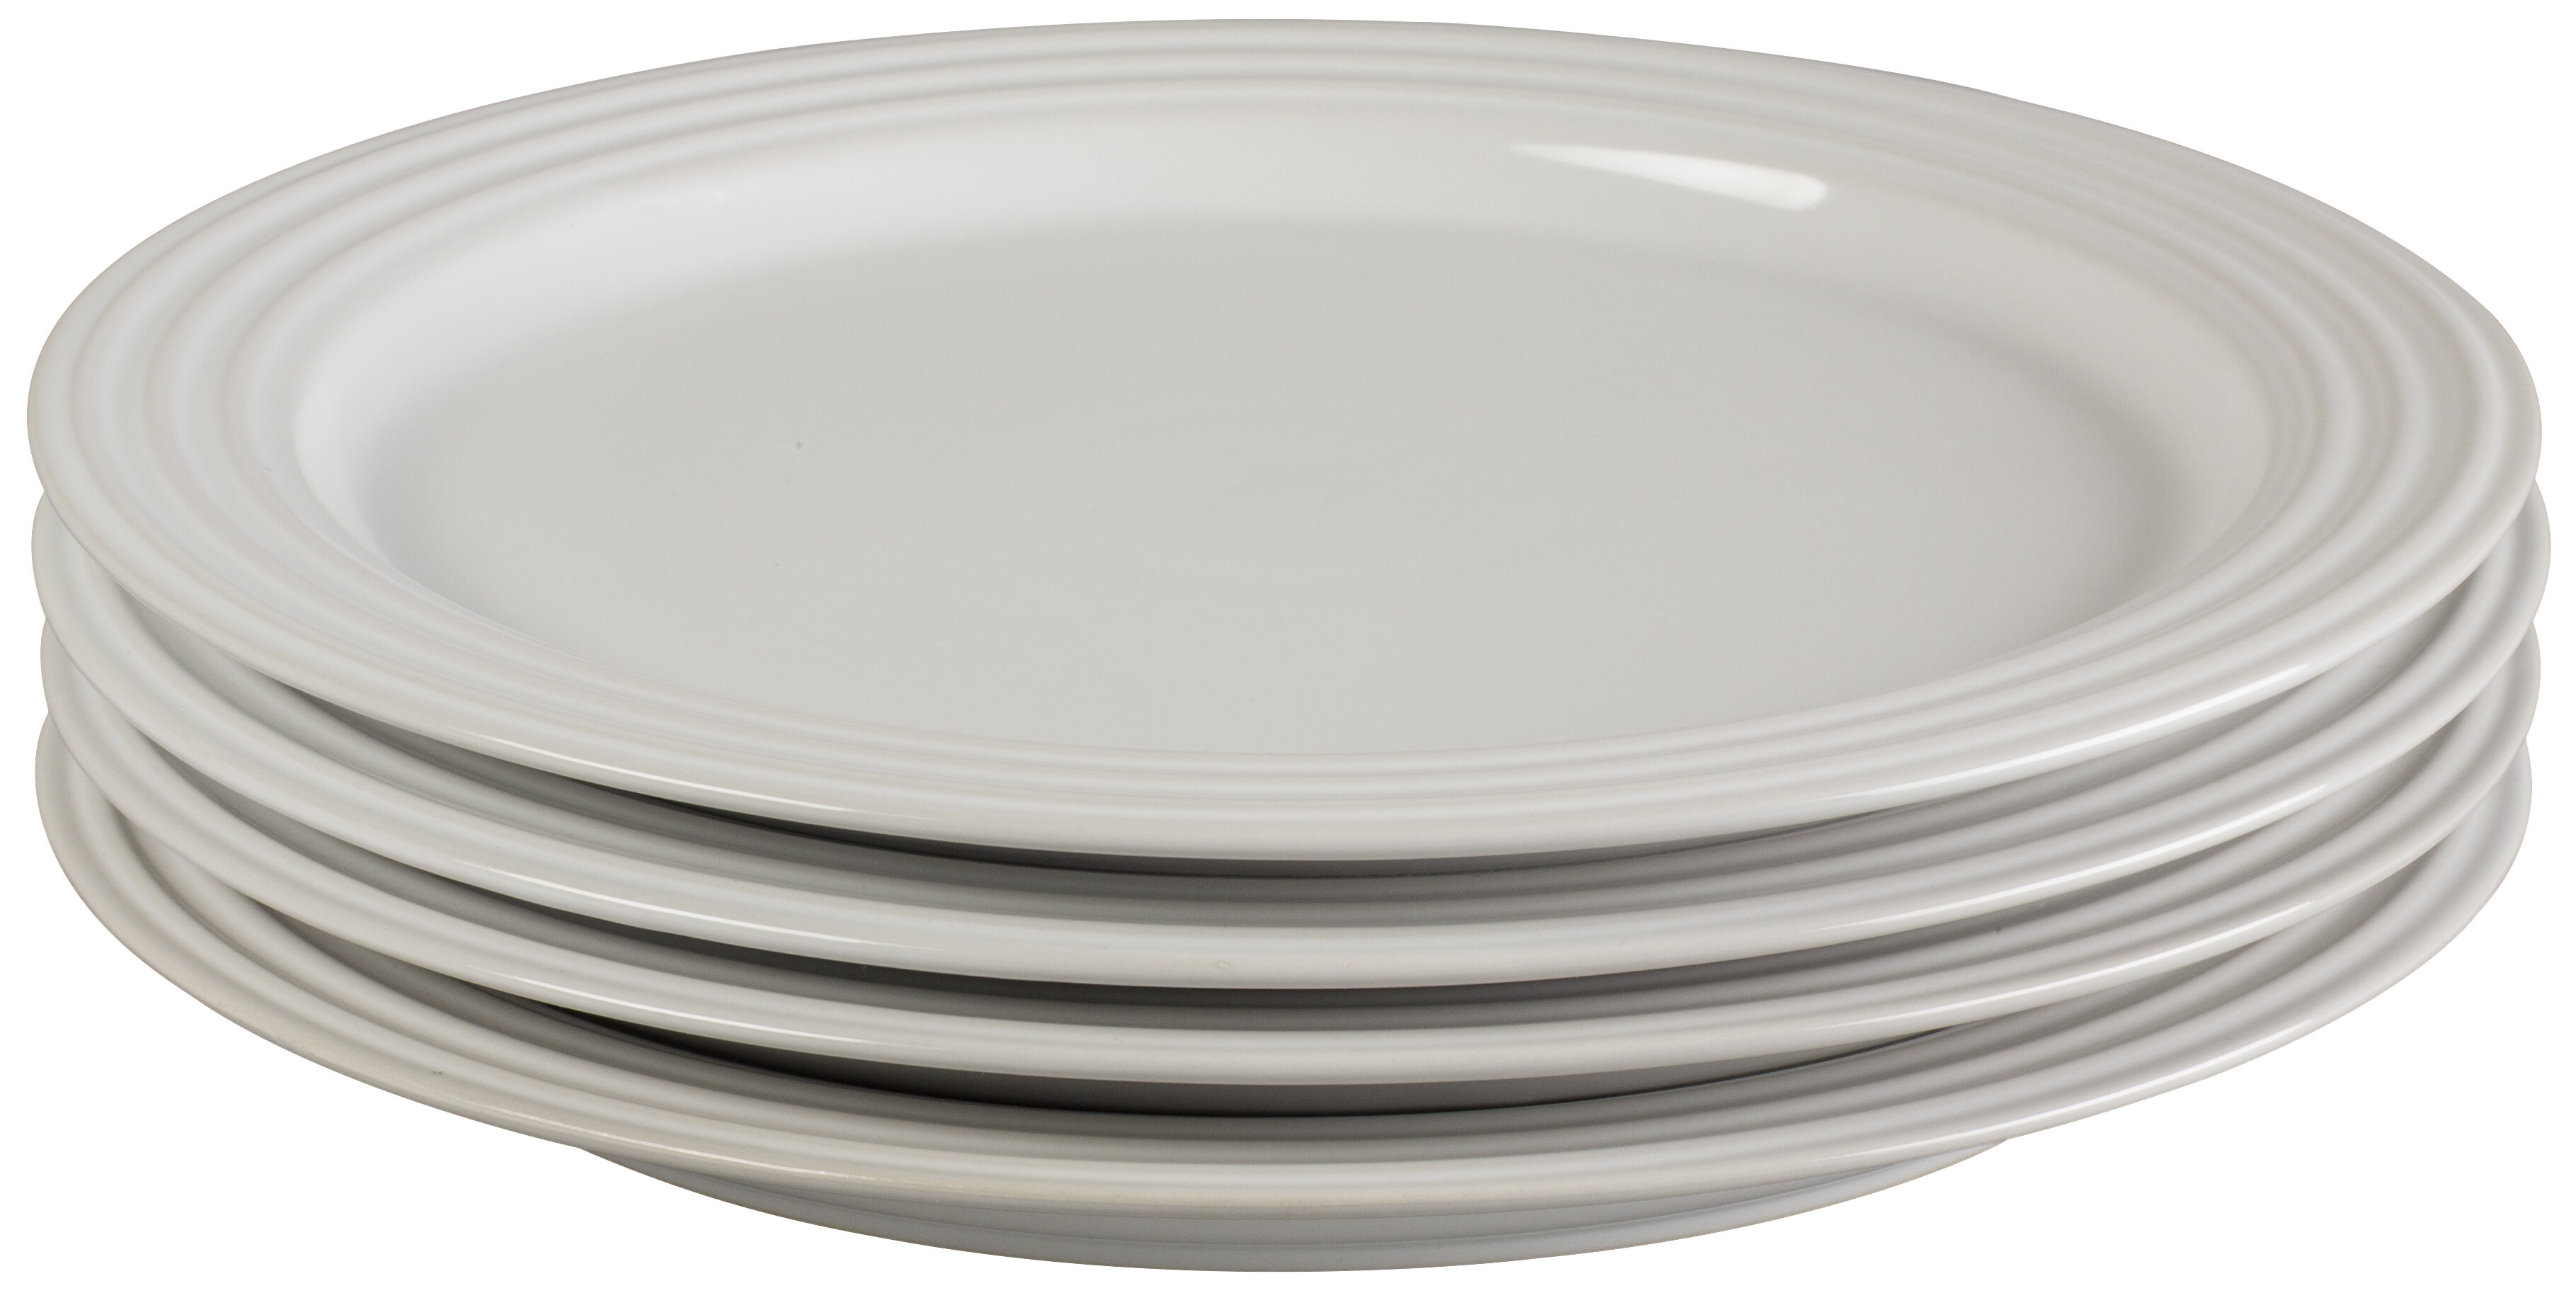 Le Creuset Dinner Plate Reviews Perigold